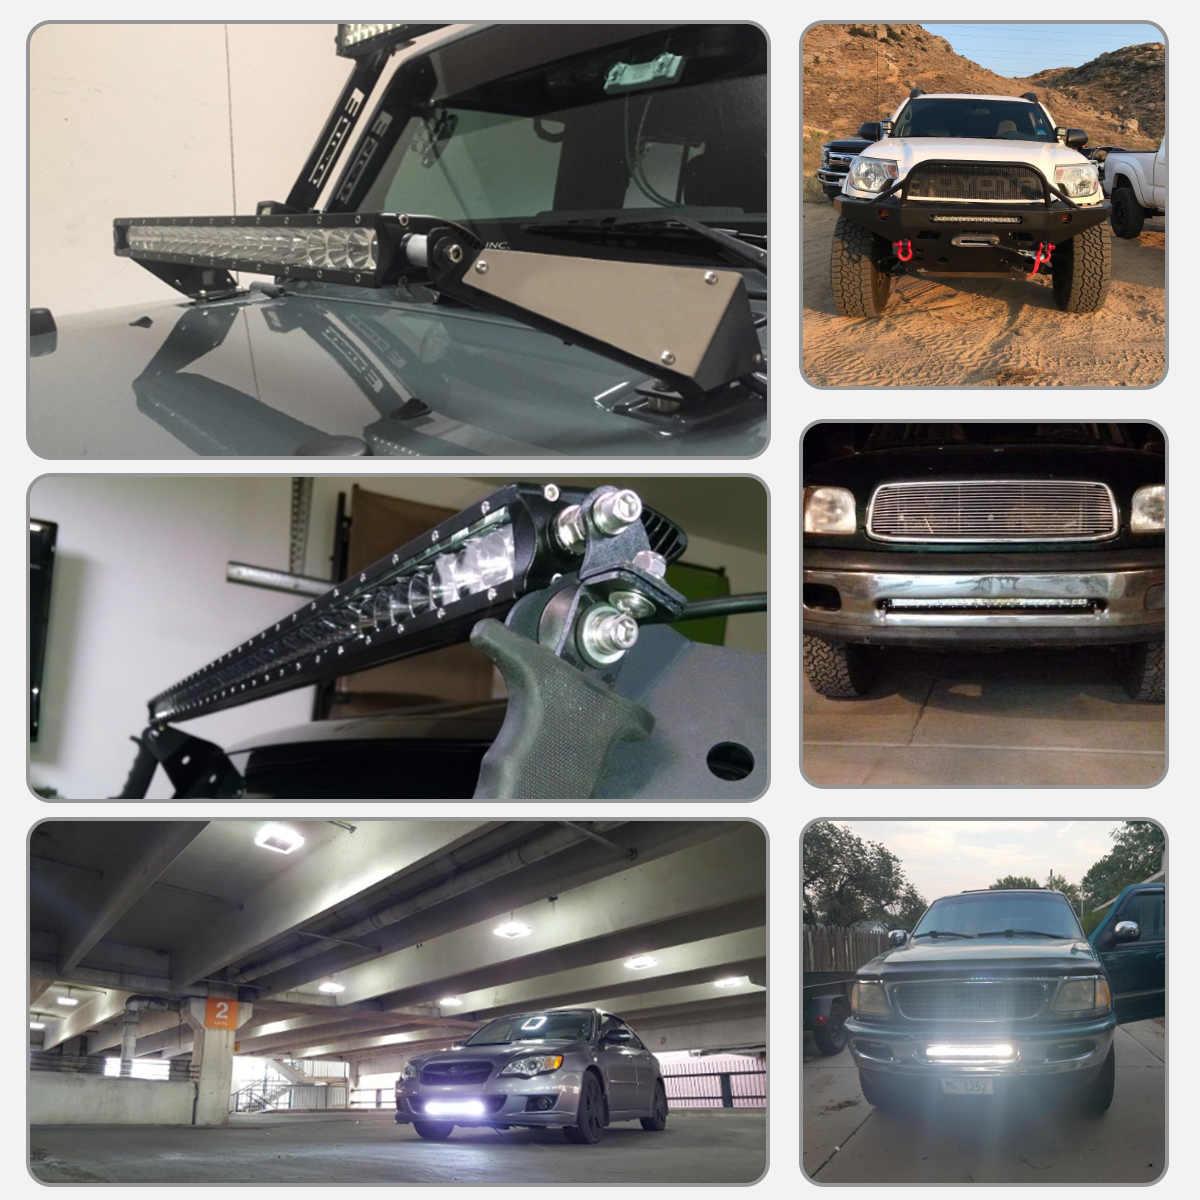 4-25 Inch LED בר LED אור בר לרכב טרקטור סירת OffRoad מכביש 4WD 4x4 משאית SUV טרקטורונים נהיגה 12 V 24 V